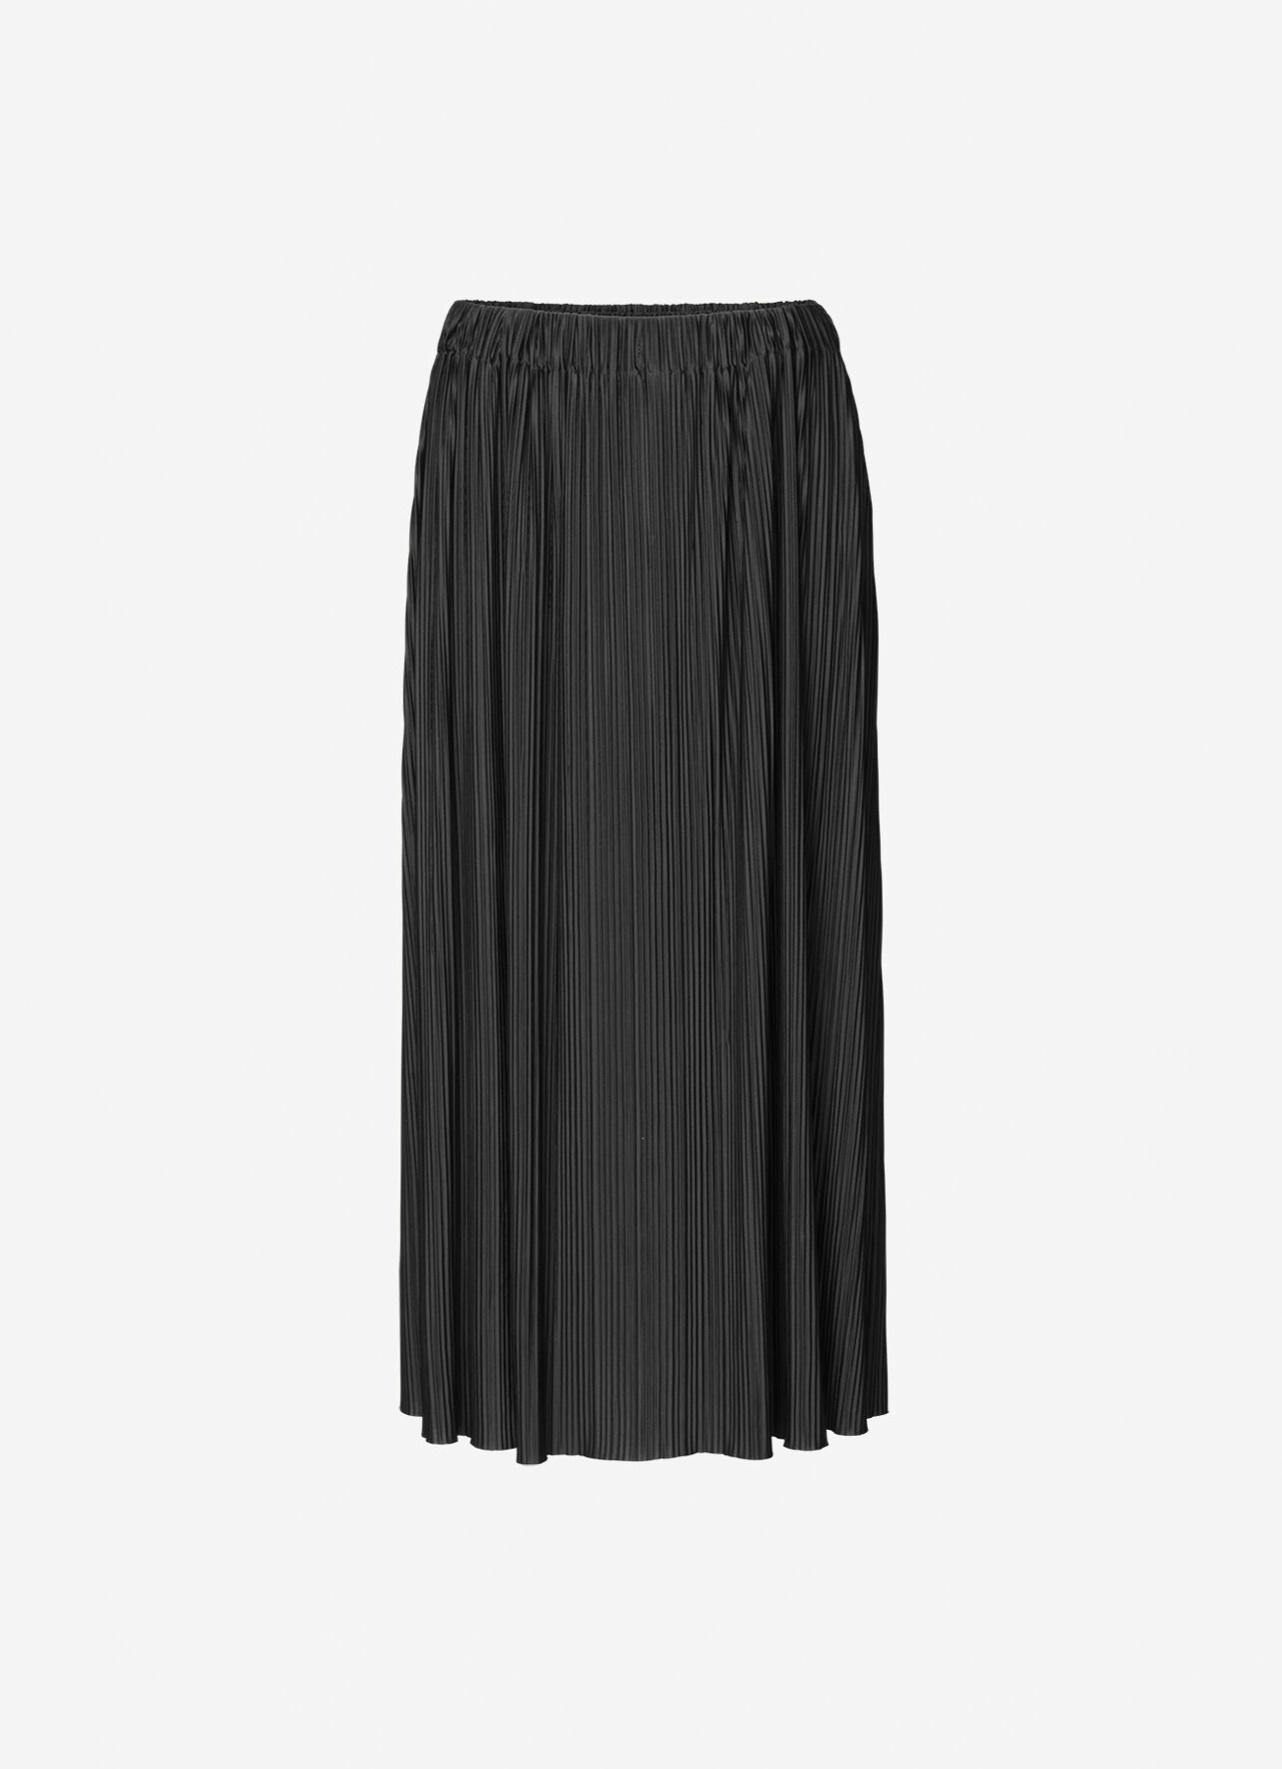 Uma Skirt-1